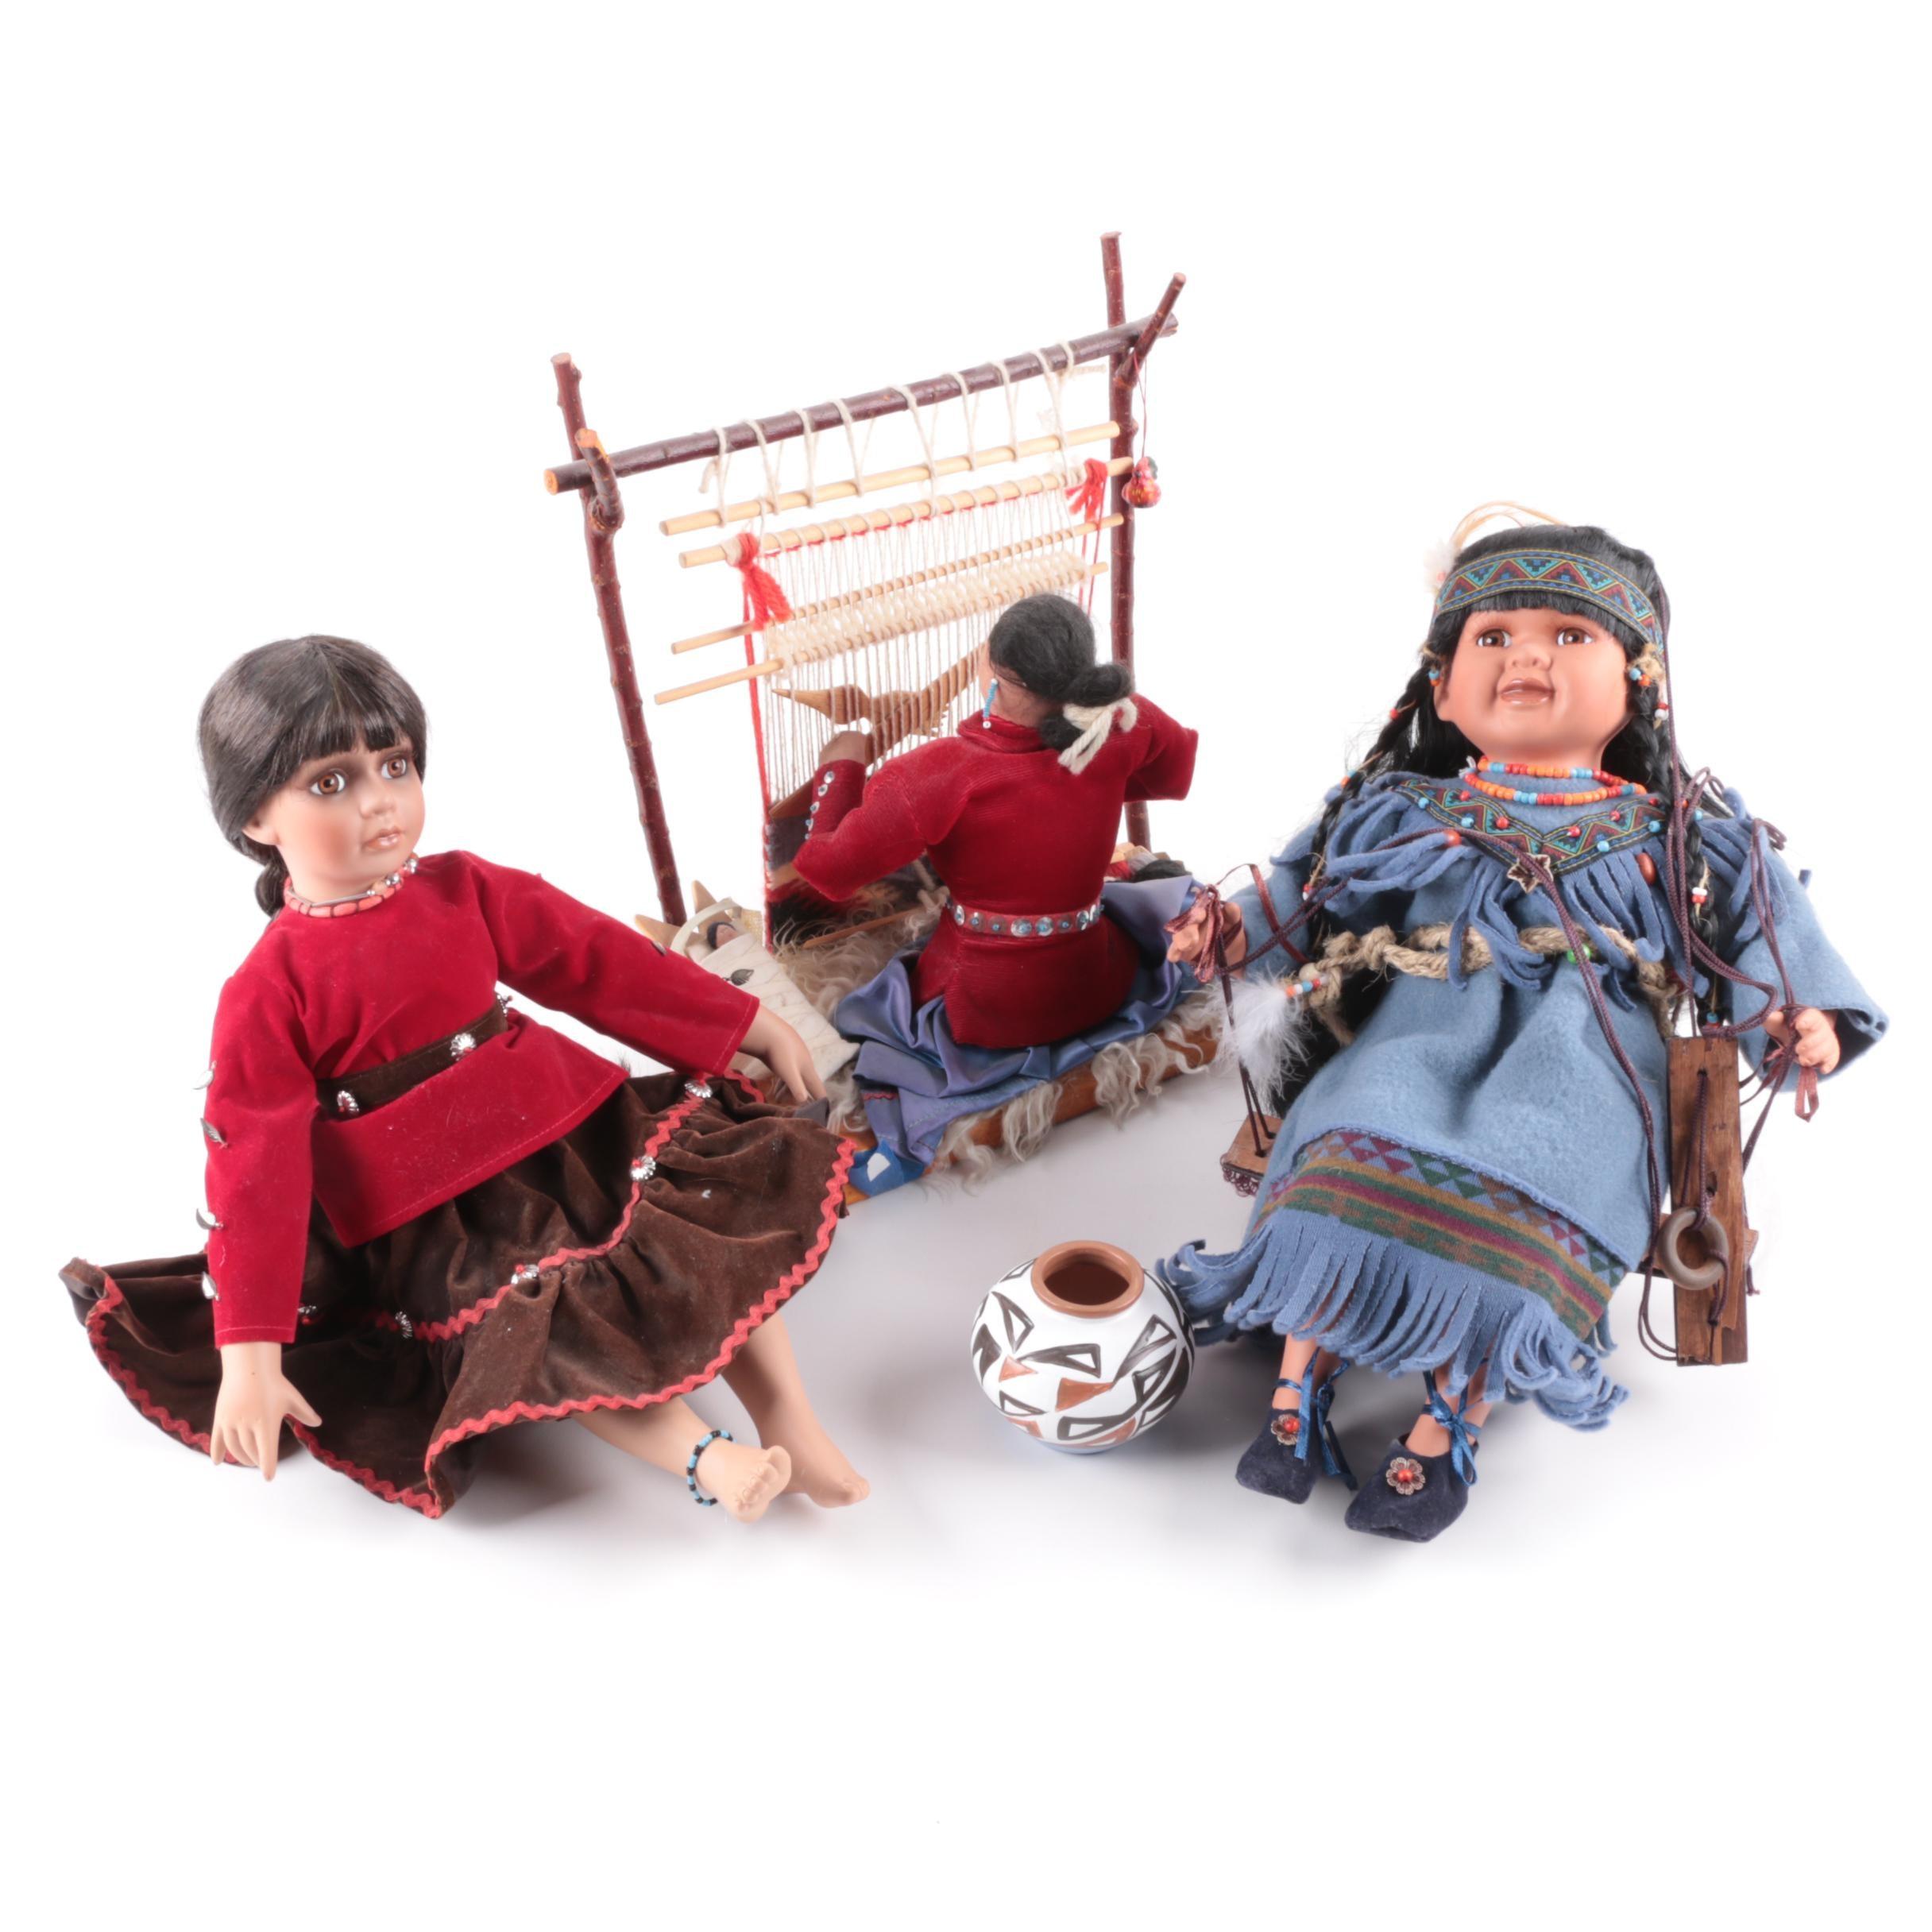 Native American Style Porcelain and Souvenir Dolls